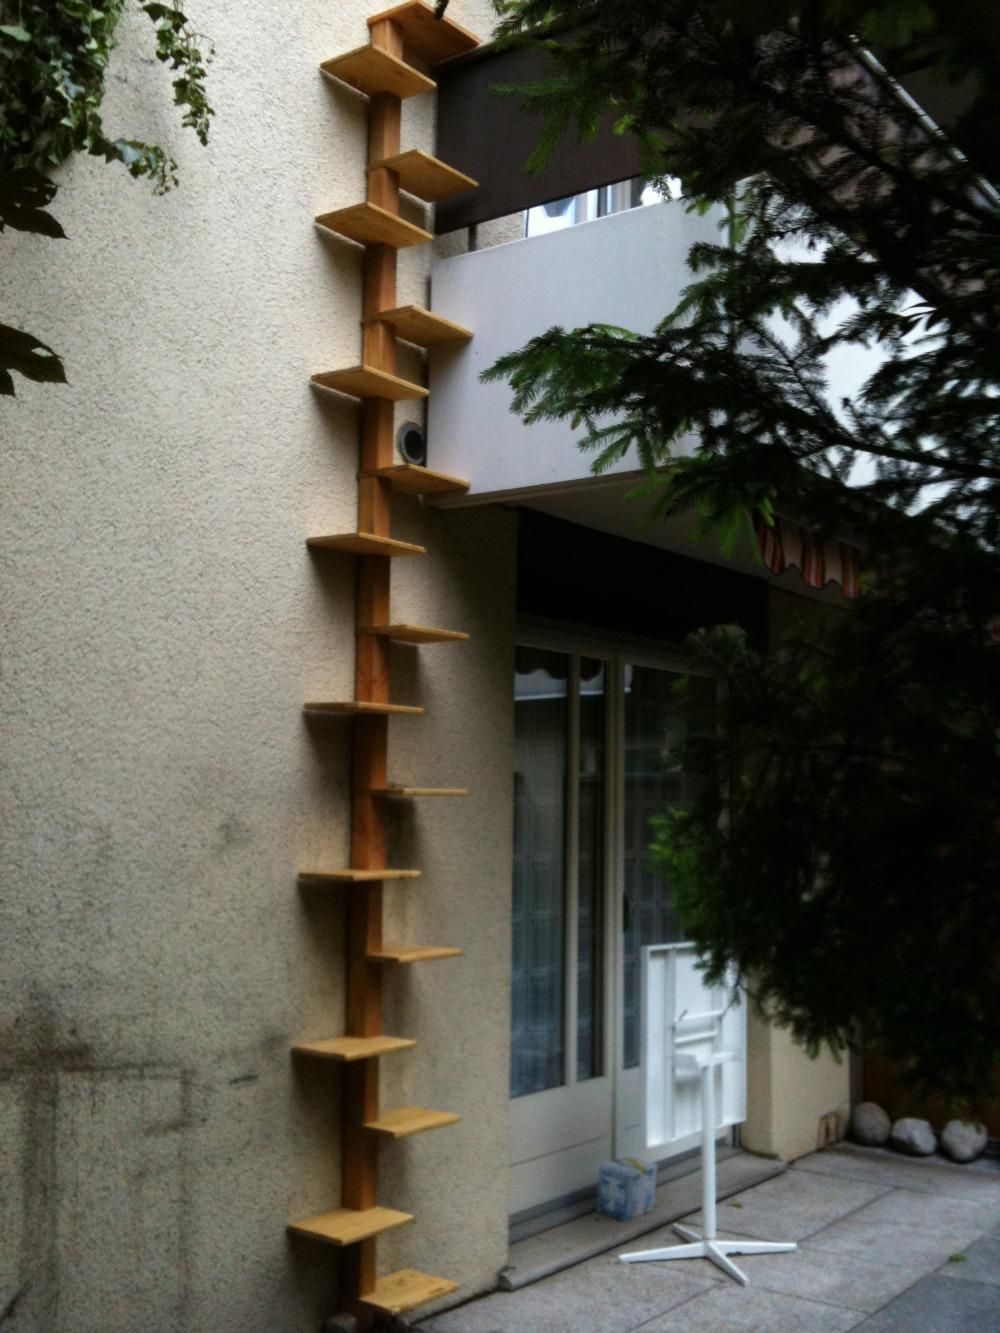 katzenleiter katzentreppe katzenwendeltreppe sr kratzbaum pinterest katzentreppe. Black Bedroom Furniture Sets. Home Design Ideas